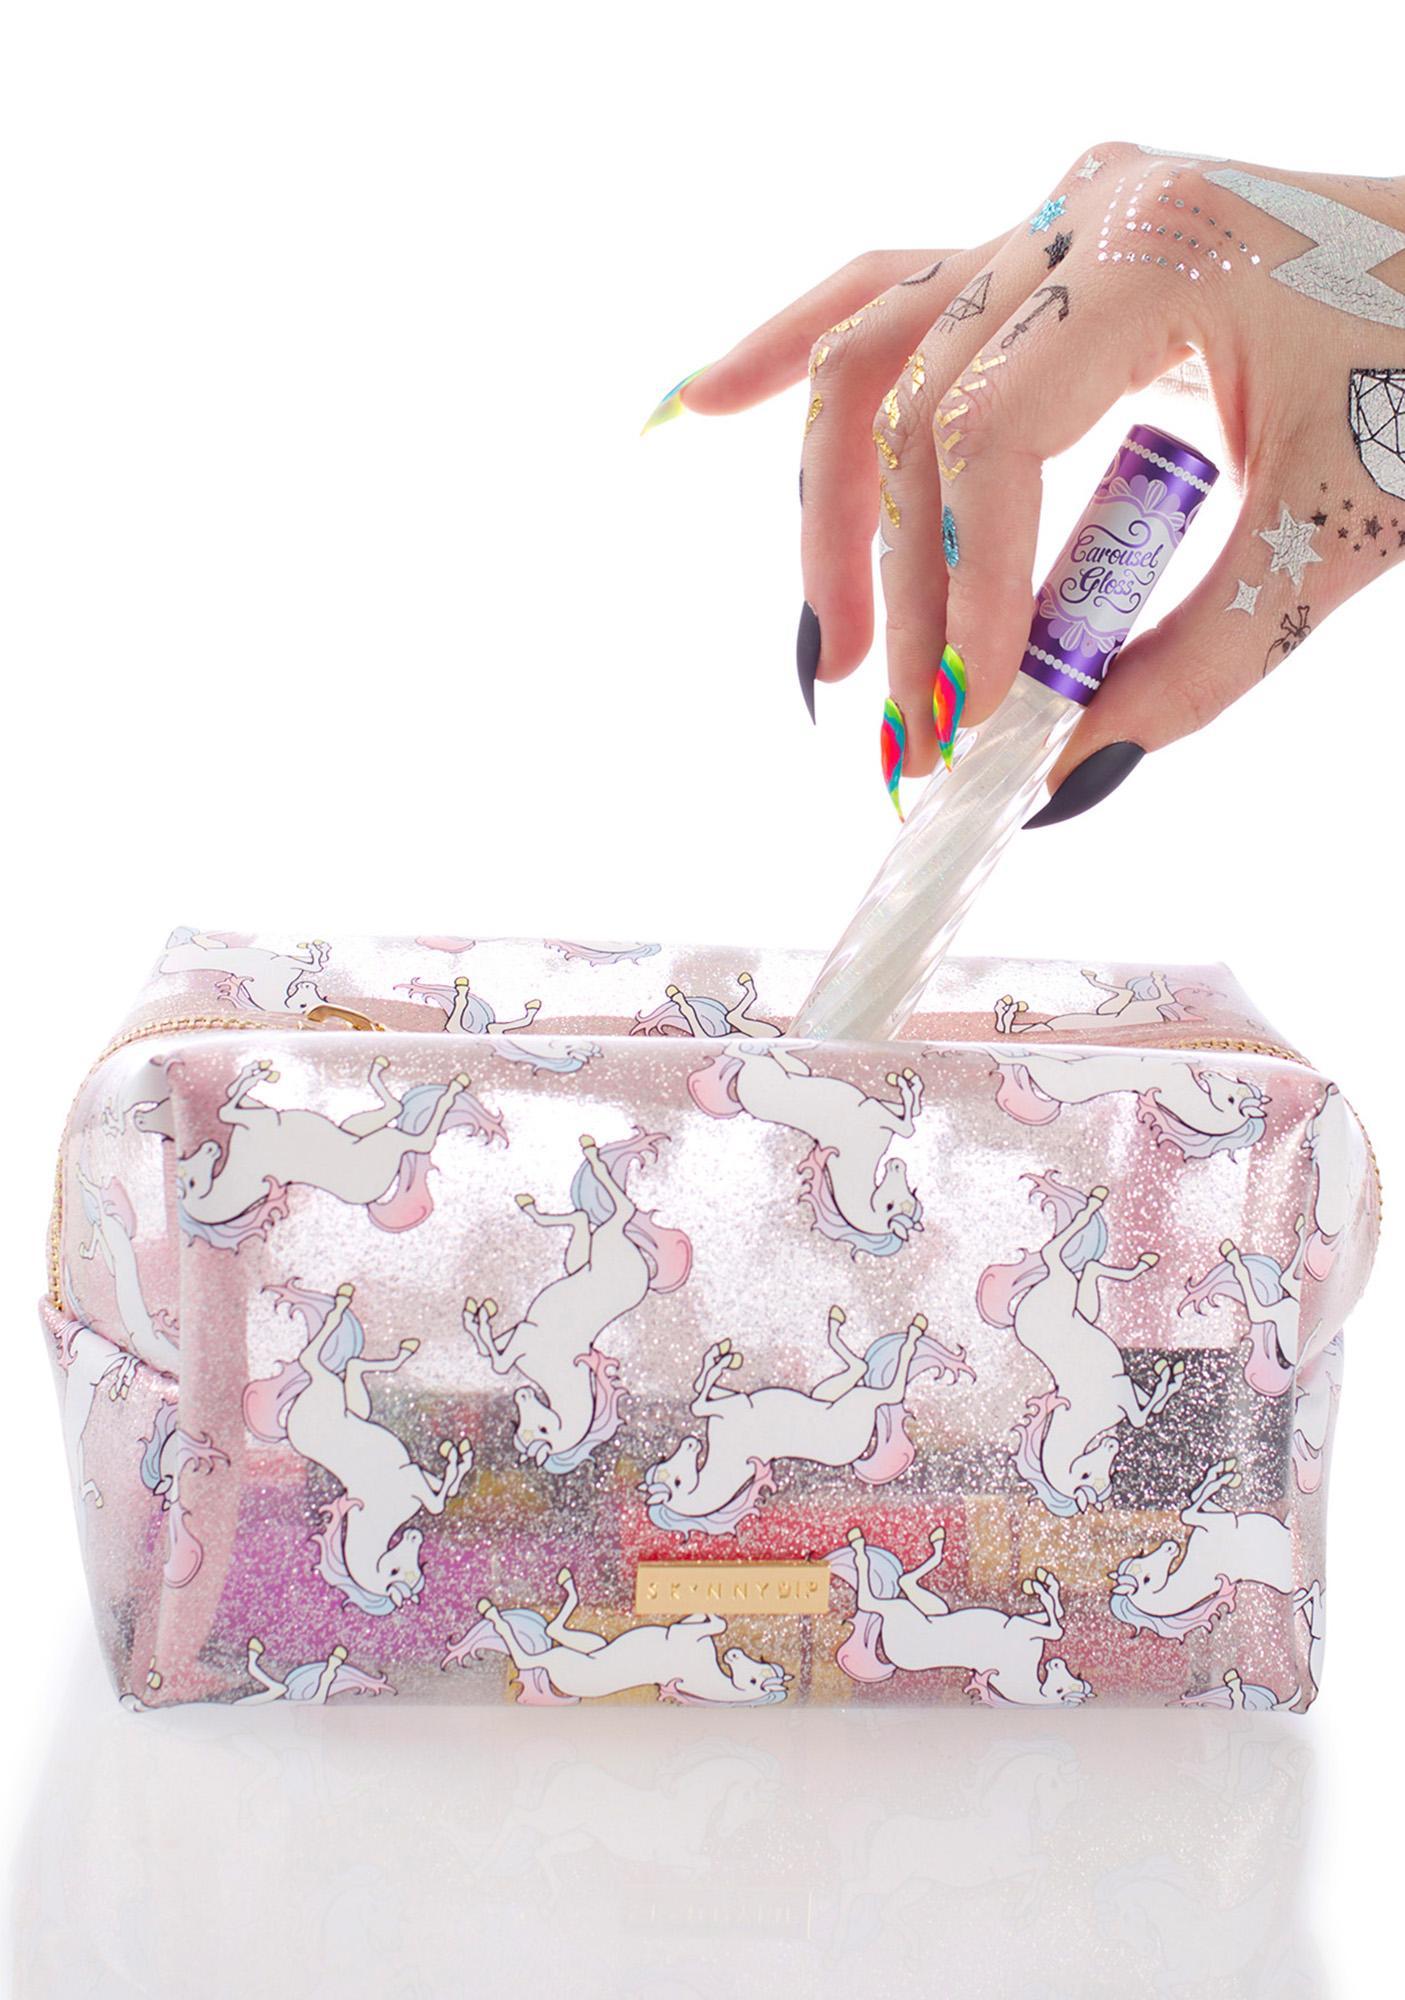 Skinnydip Glitter Unicorn Makeup Bag